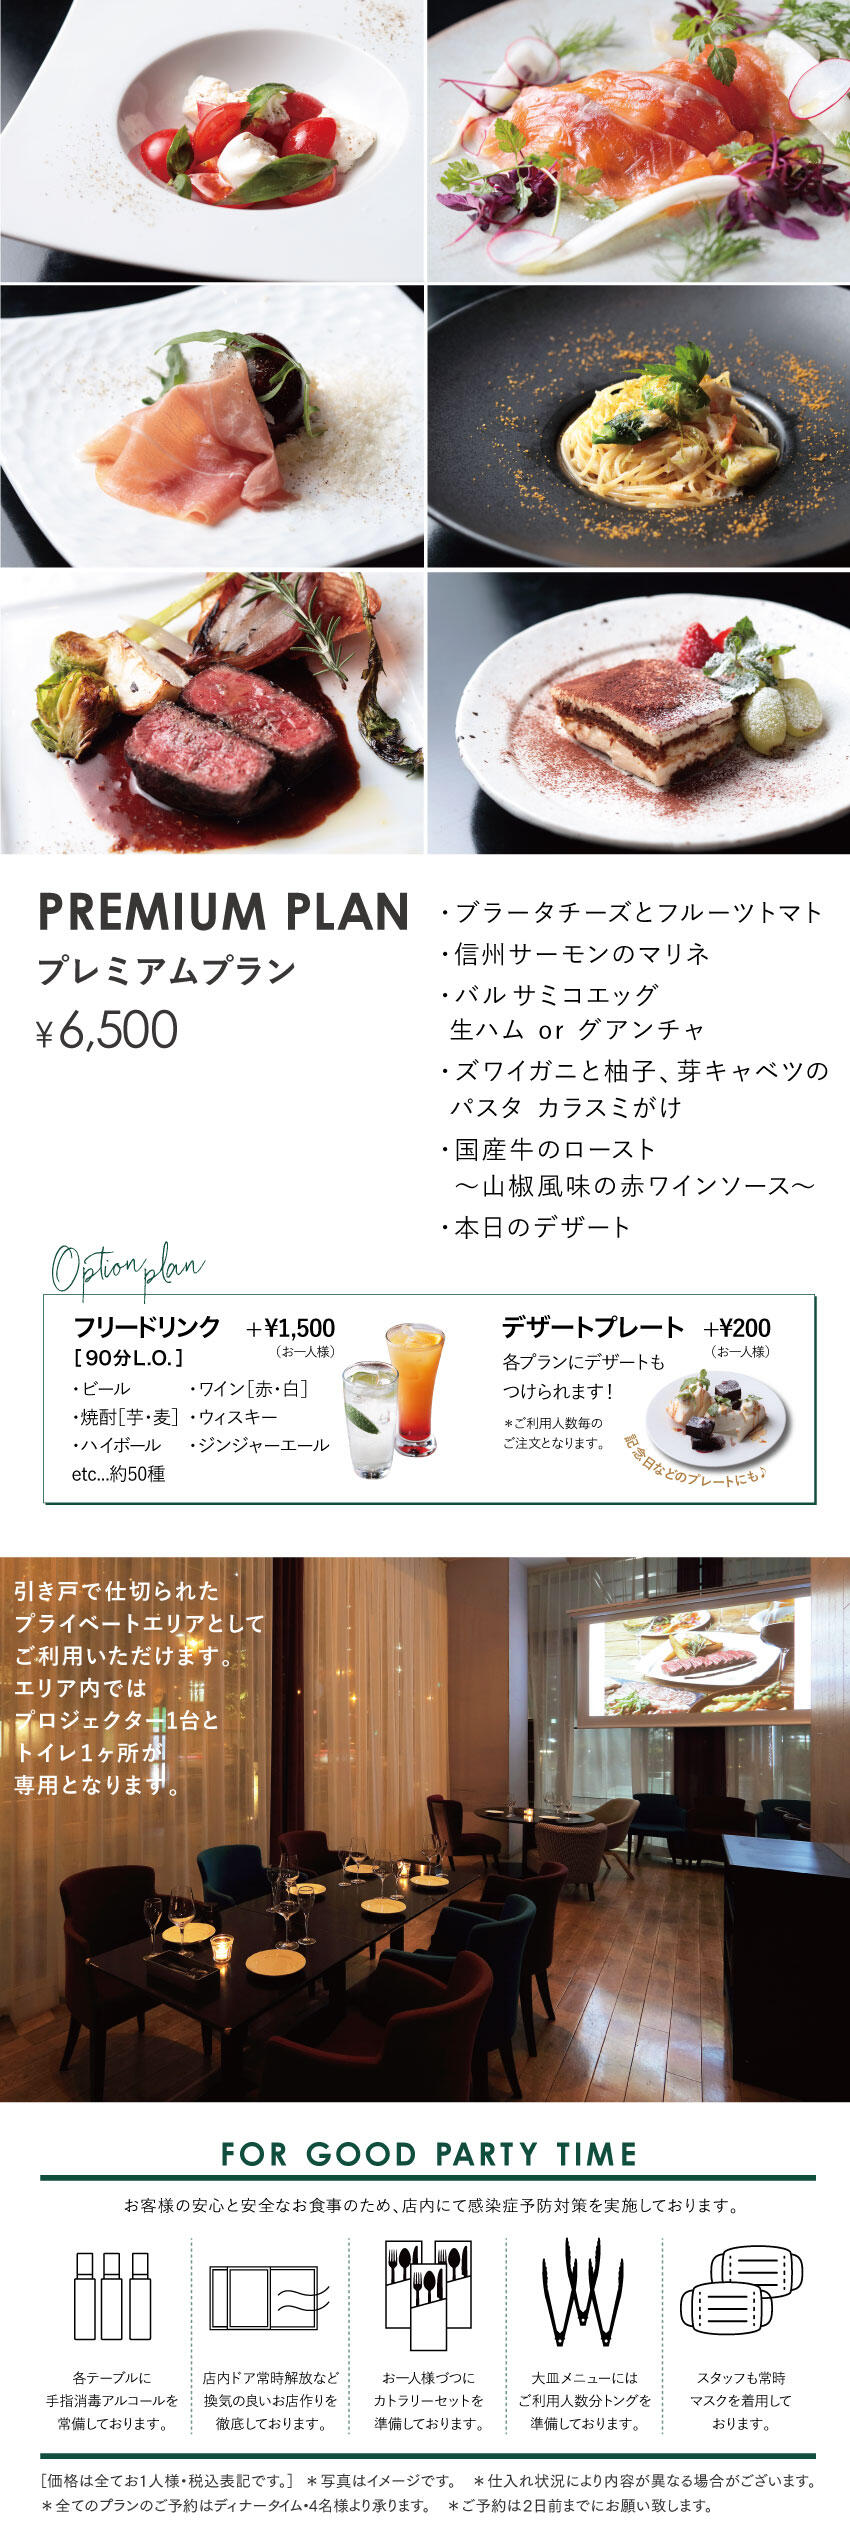 gmck_plan_3.jpg